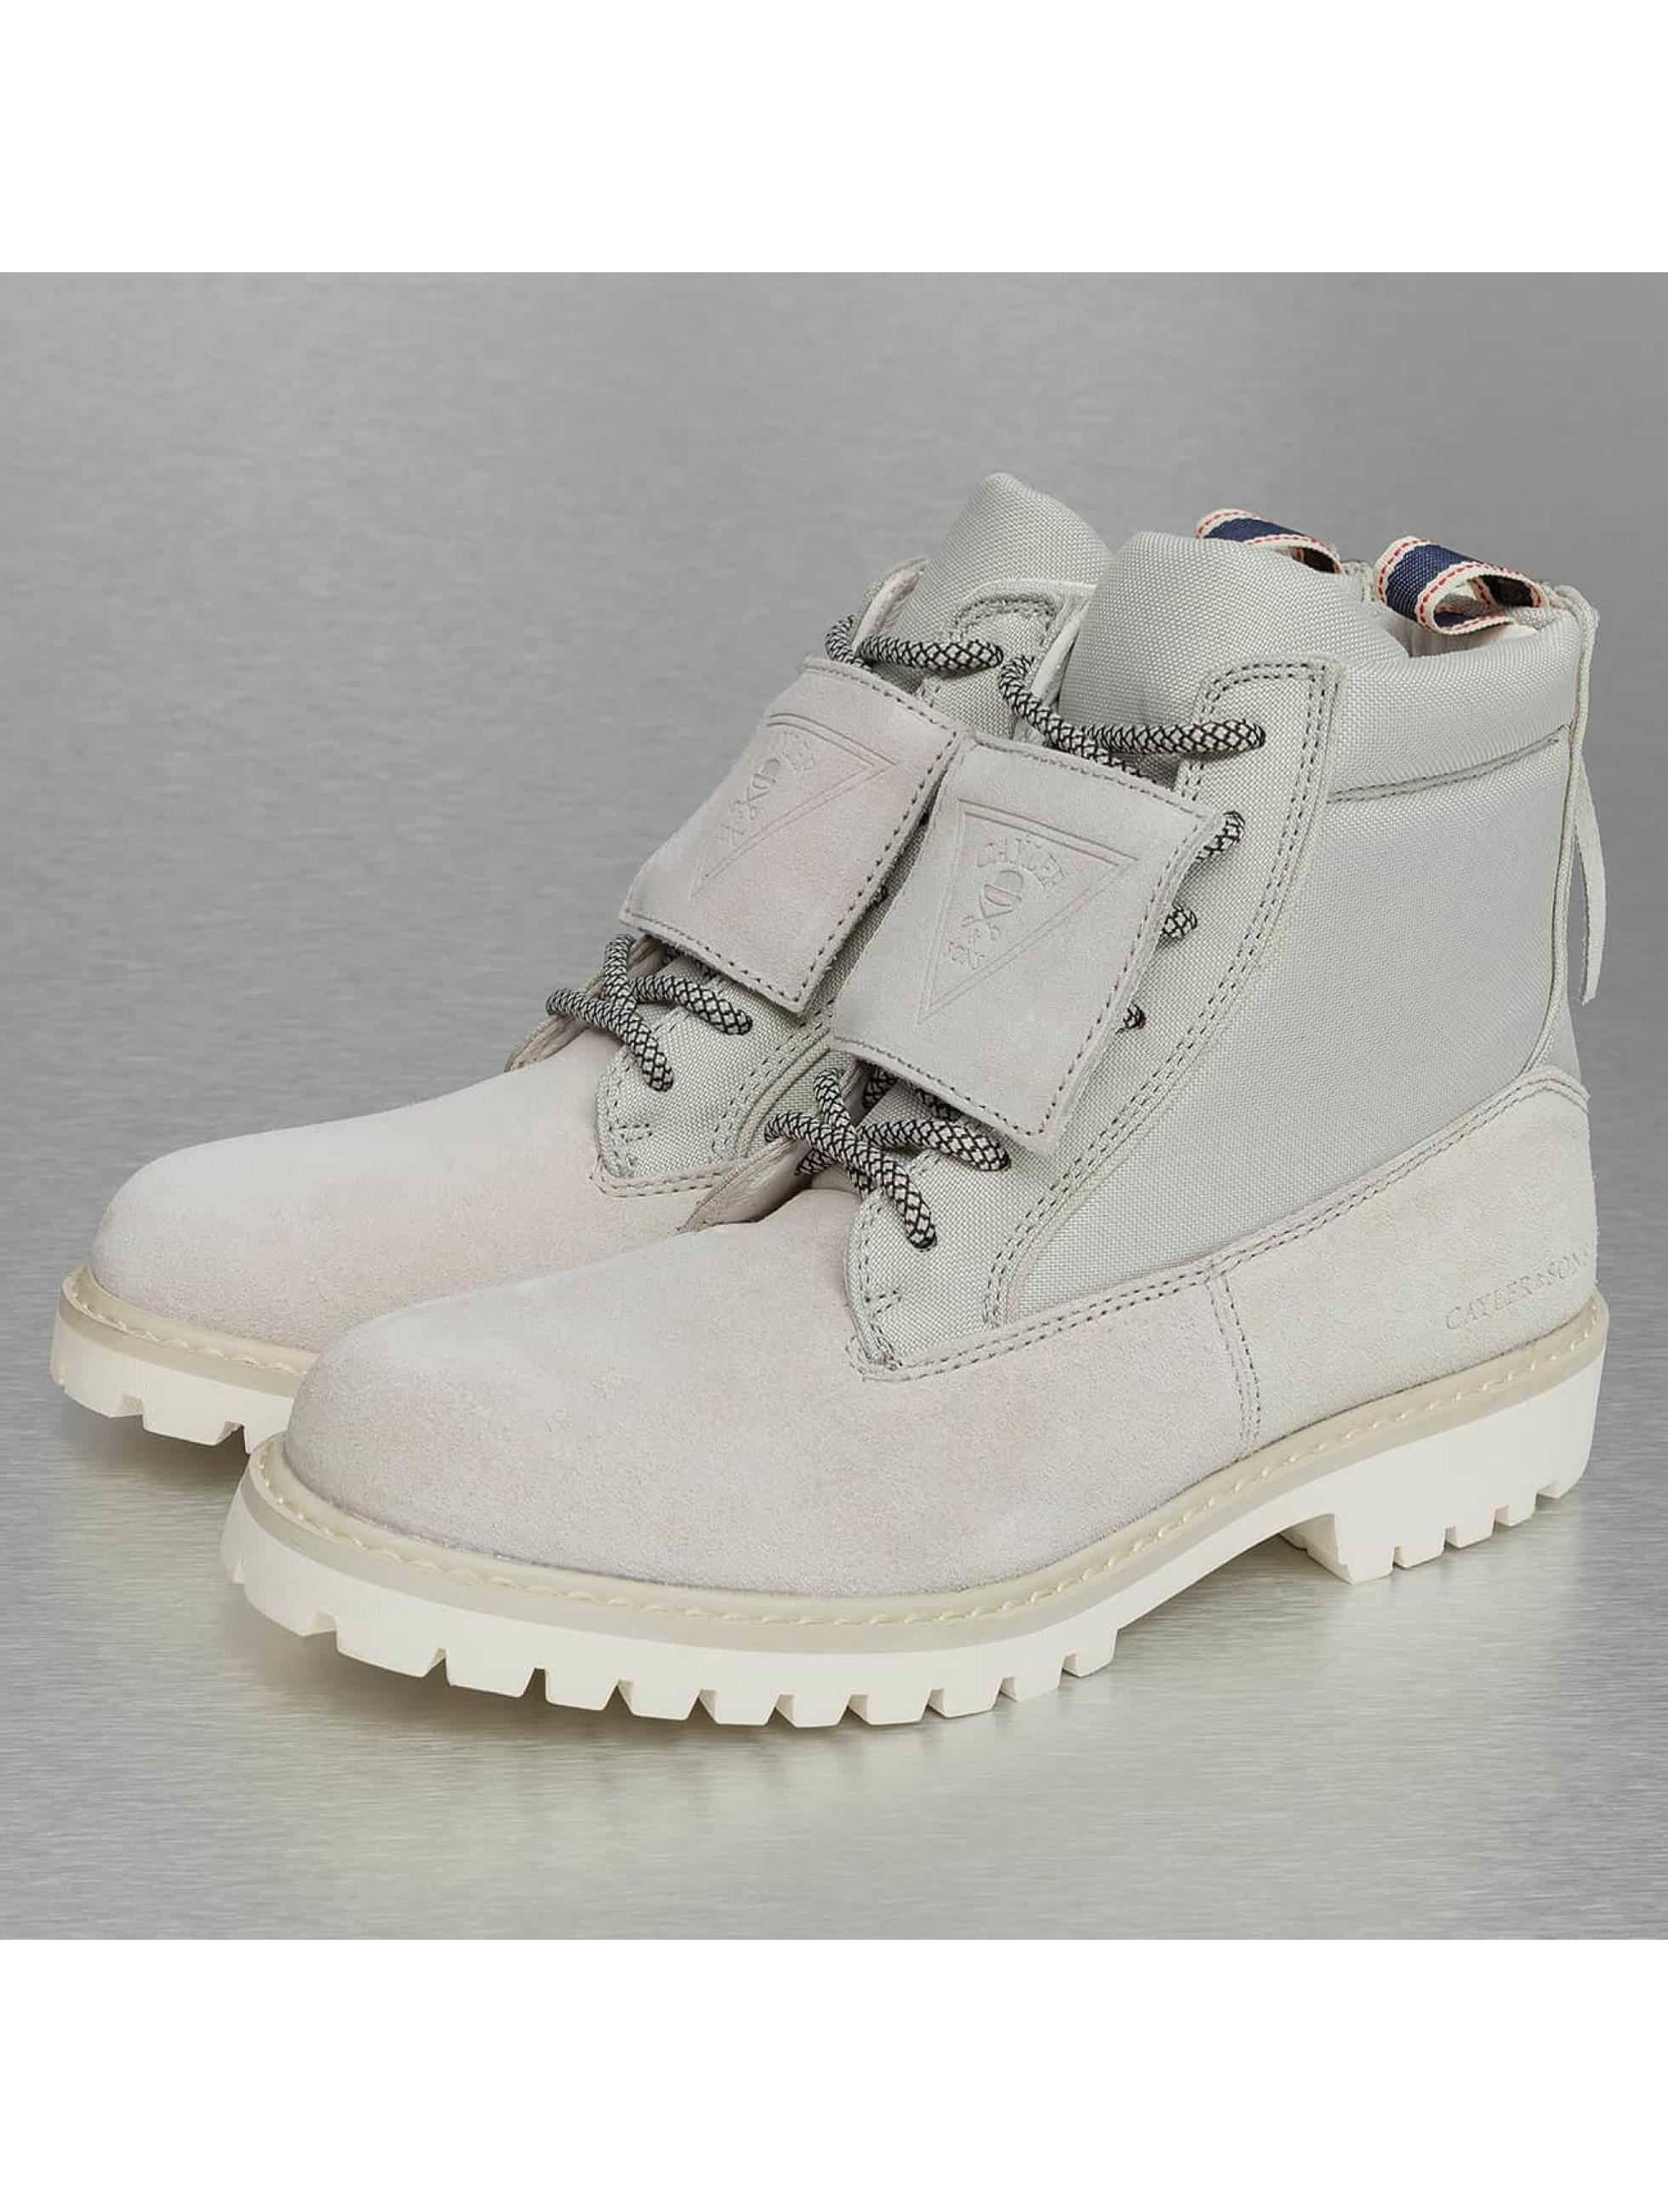 Boots Hibachi in grau